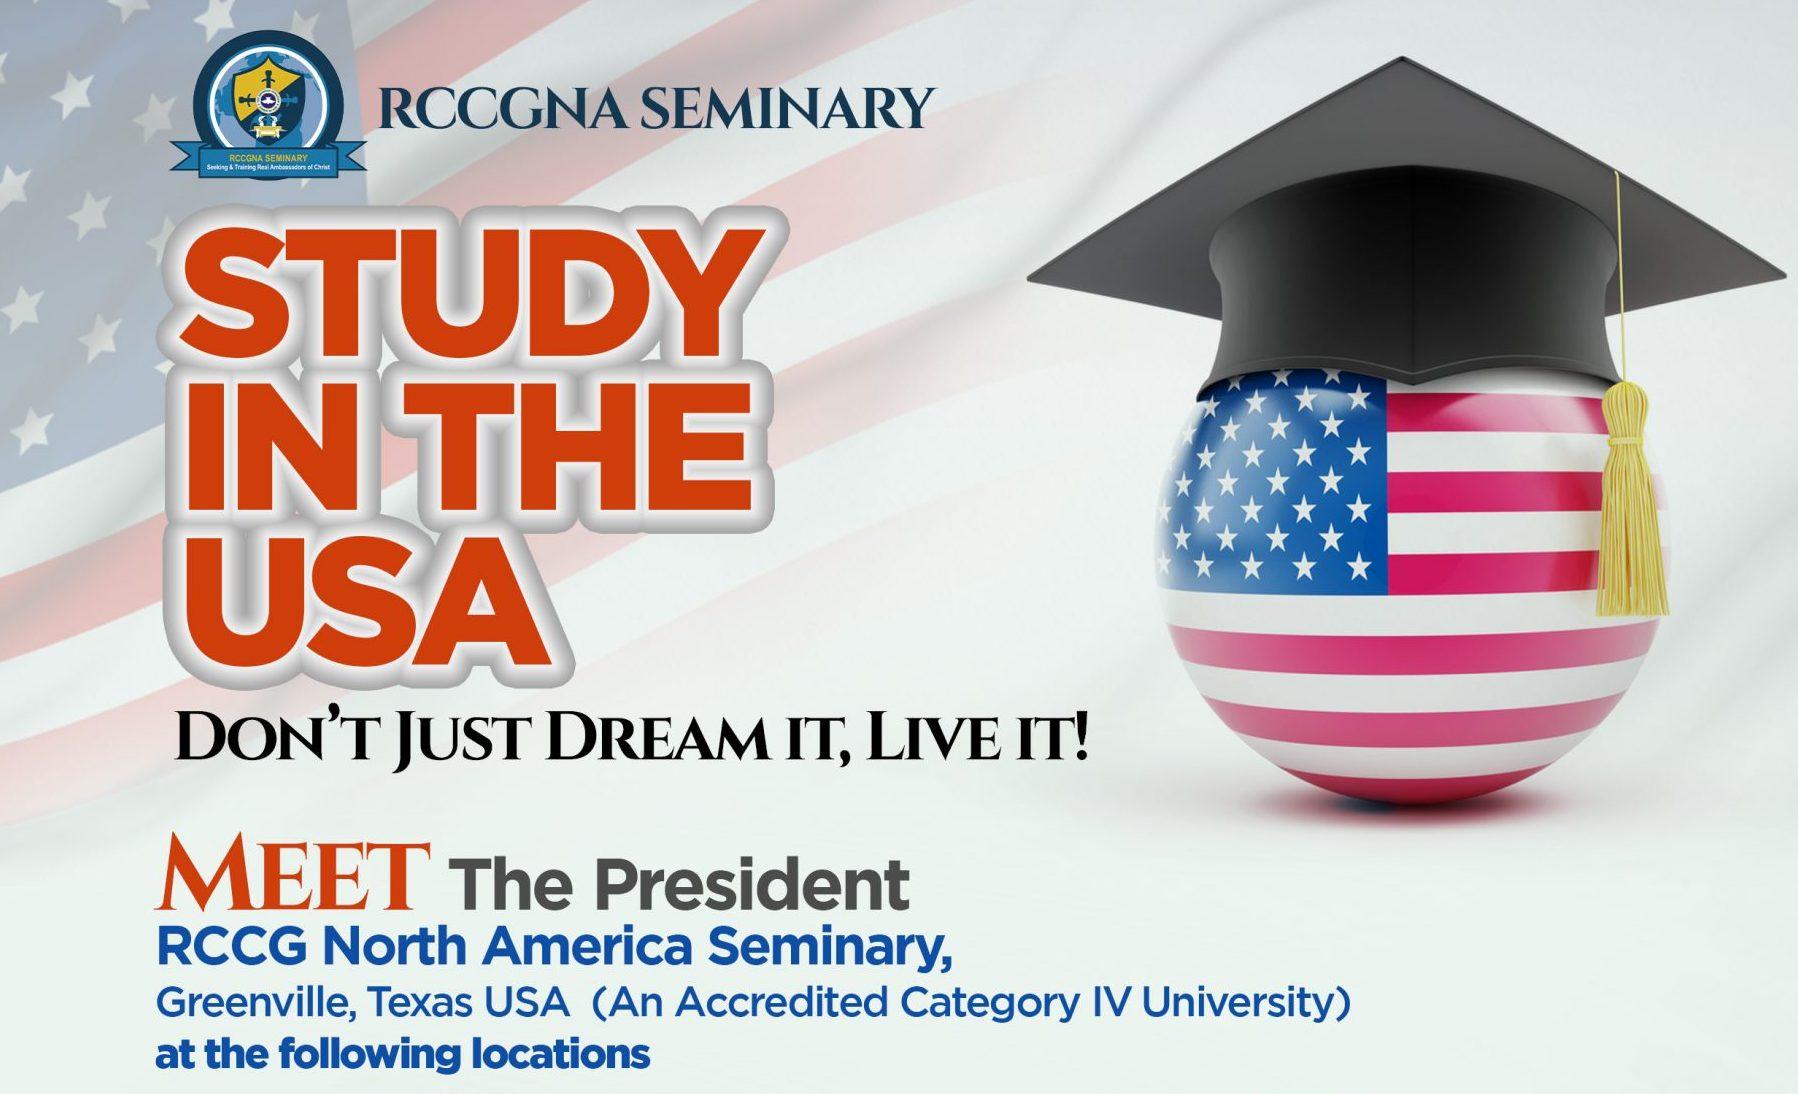 Meet the President RCCG North America Seminary, Greenville, Texas USA